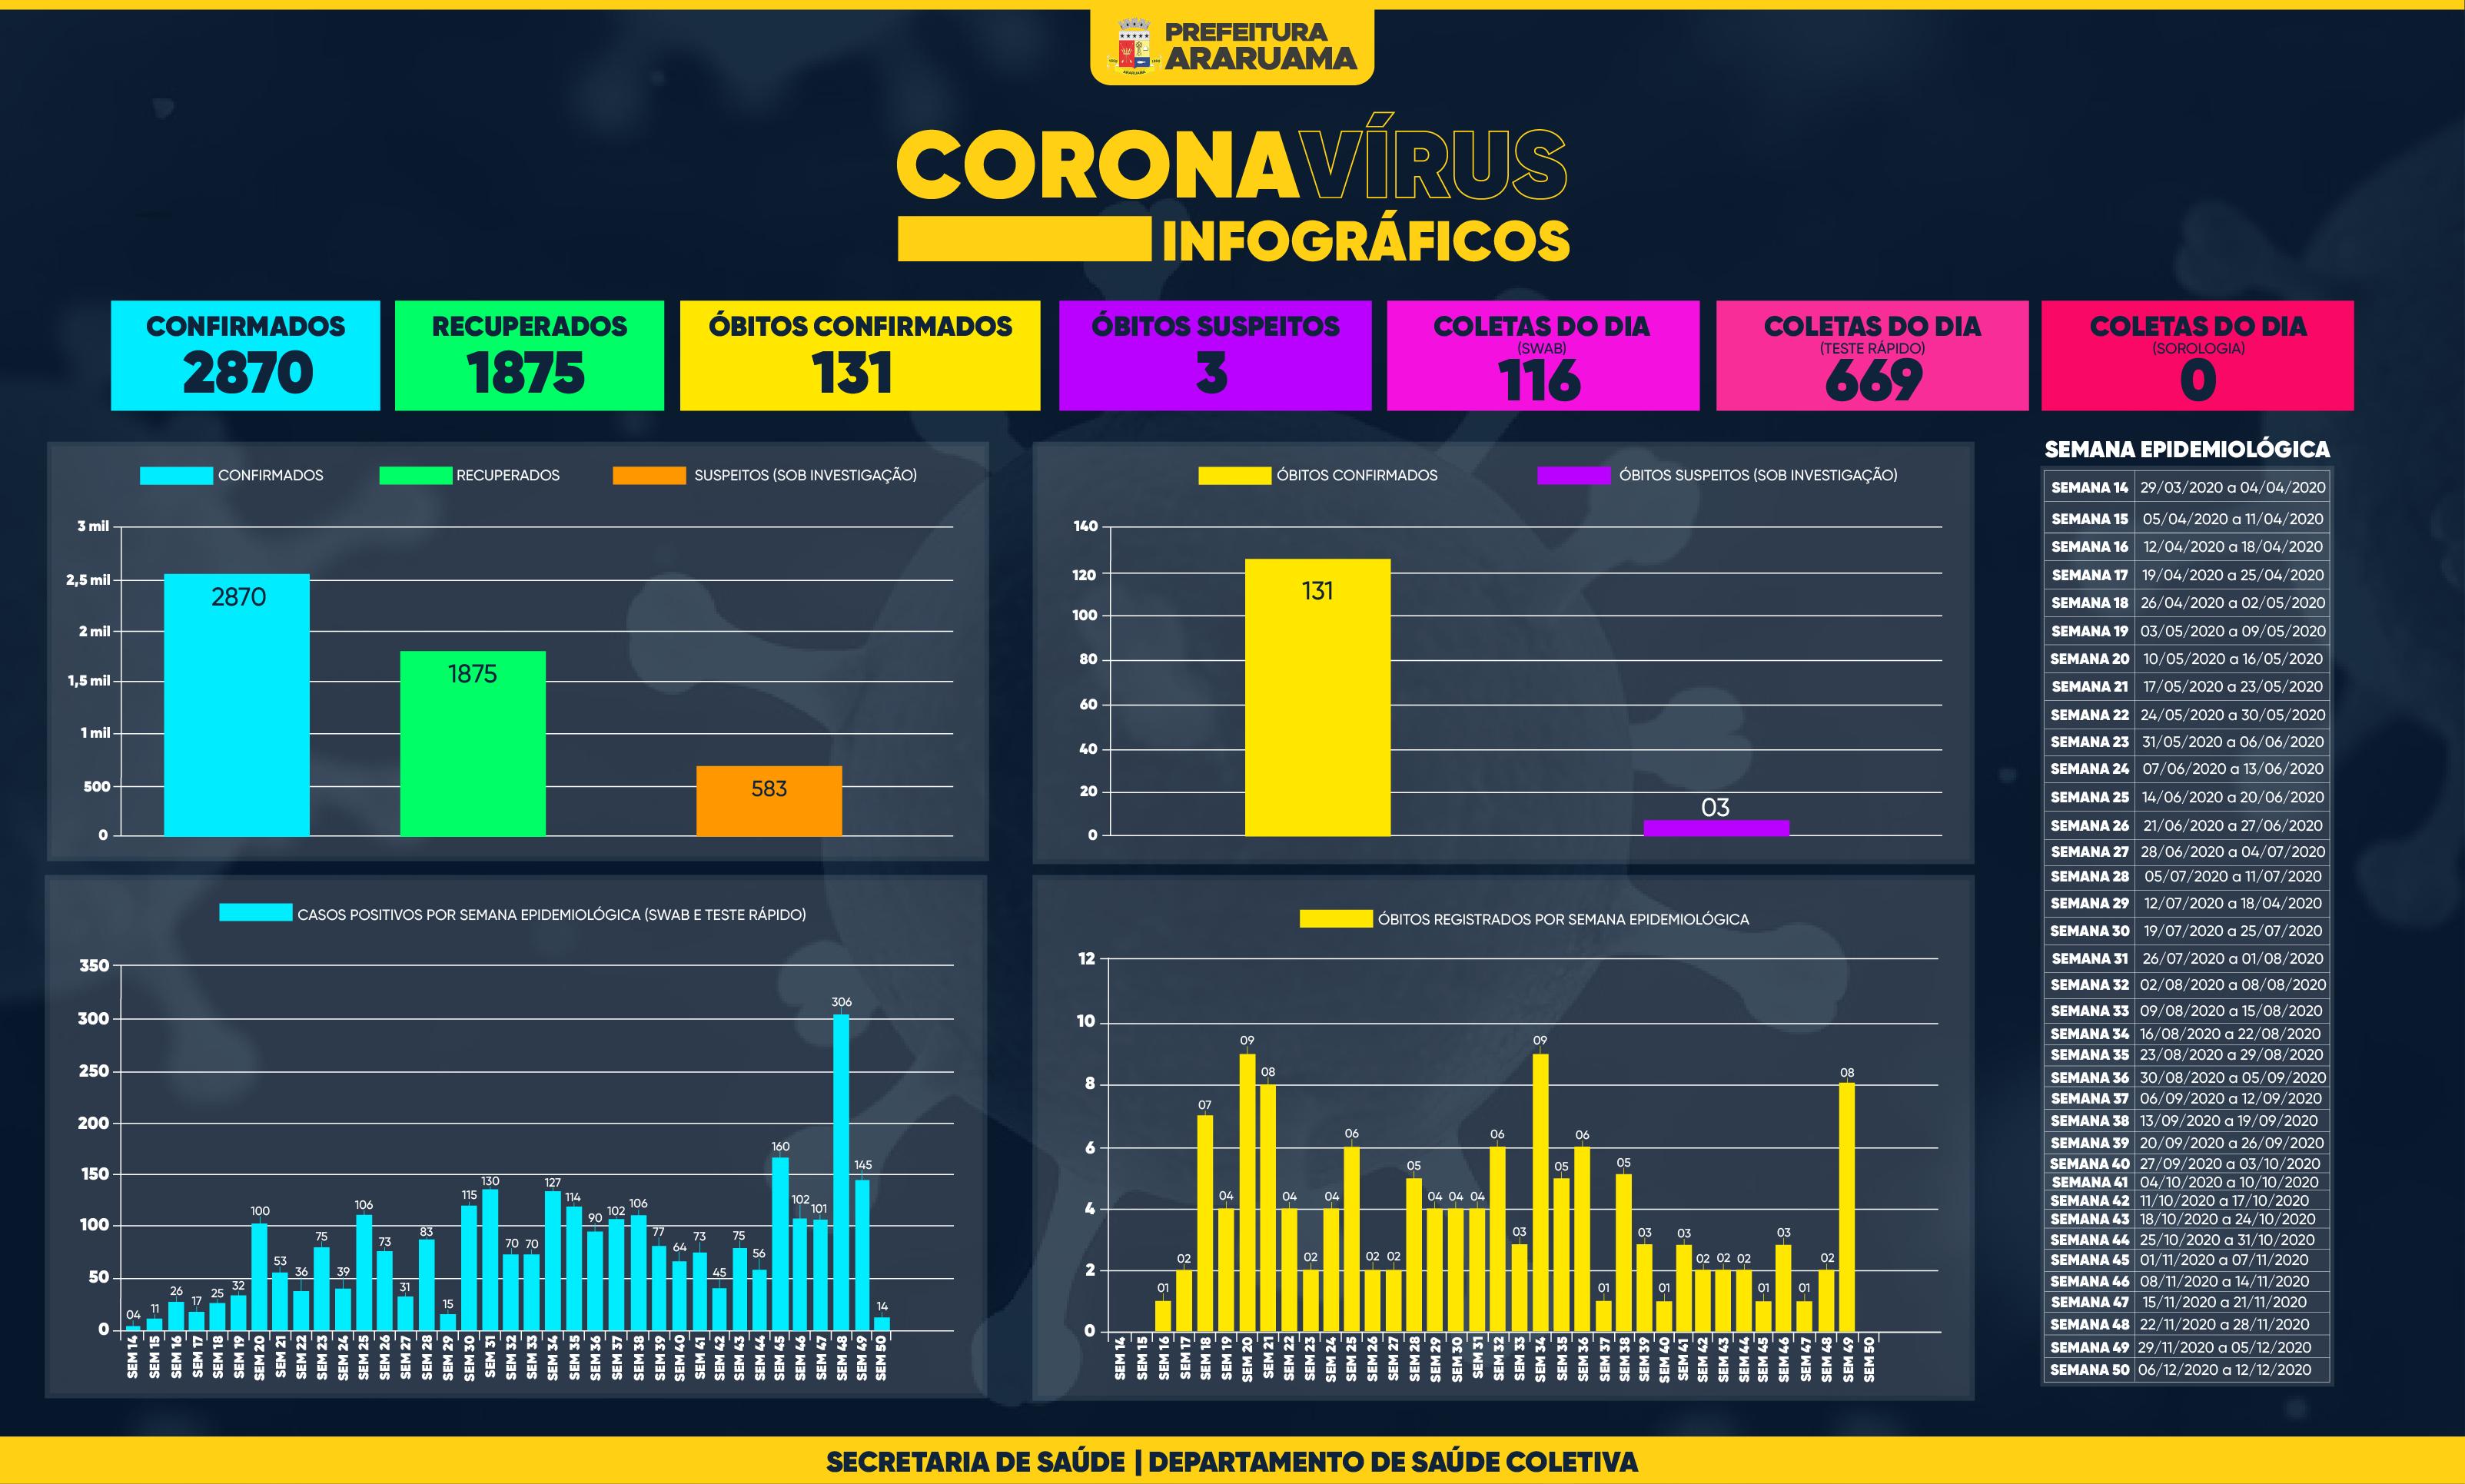 Painel de Monitoramento COVID-19 — Semana 50 — 08 de dezembro de 2020